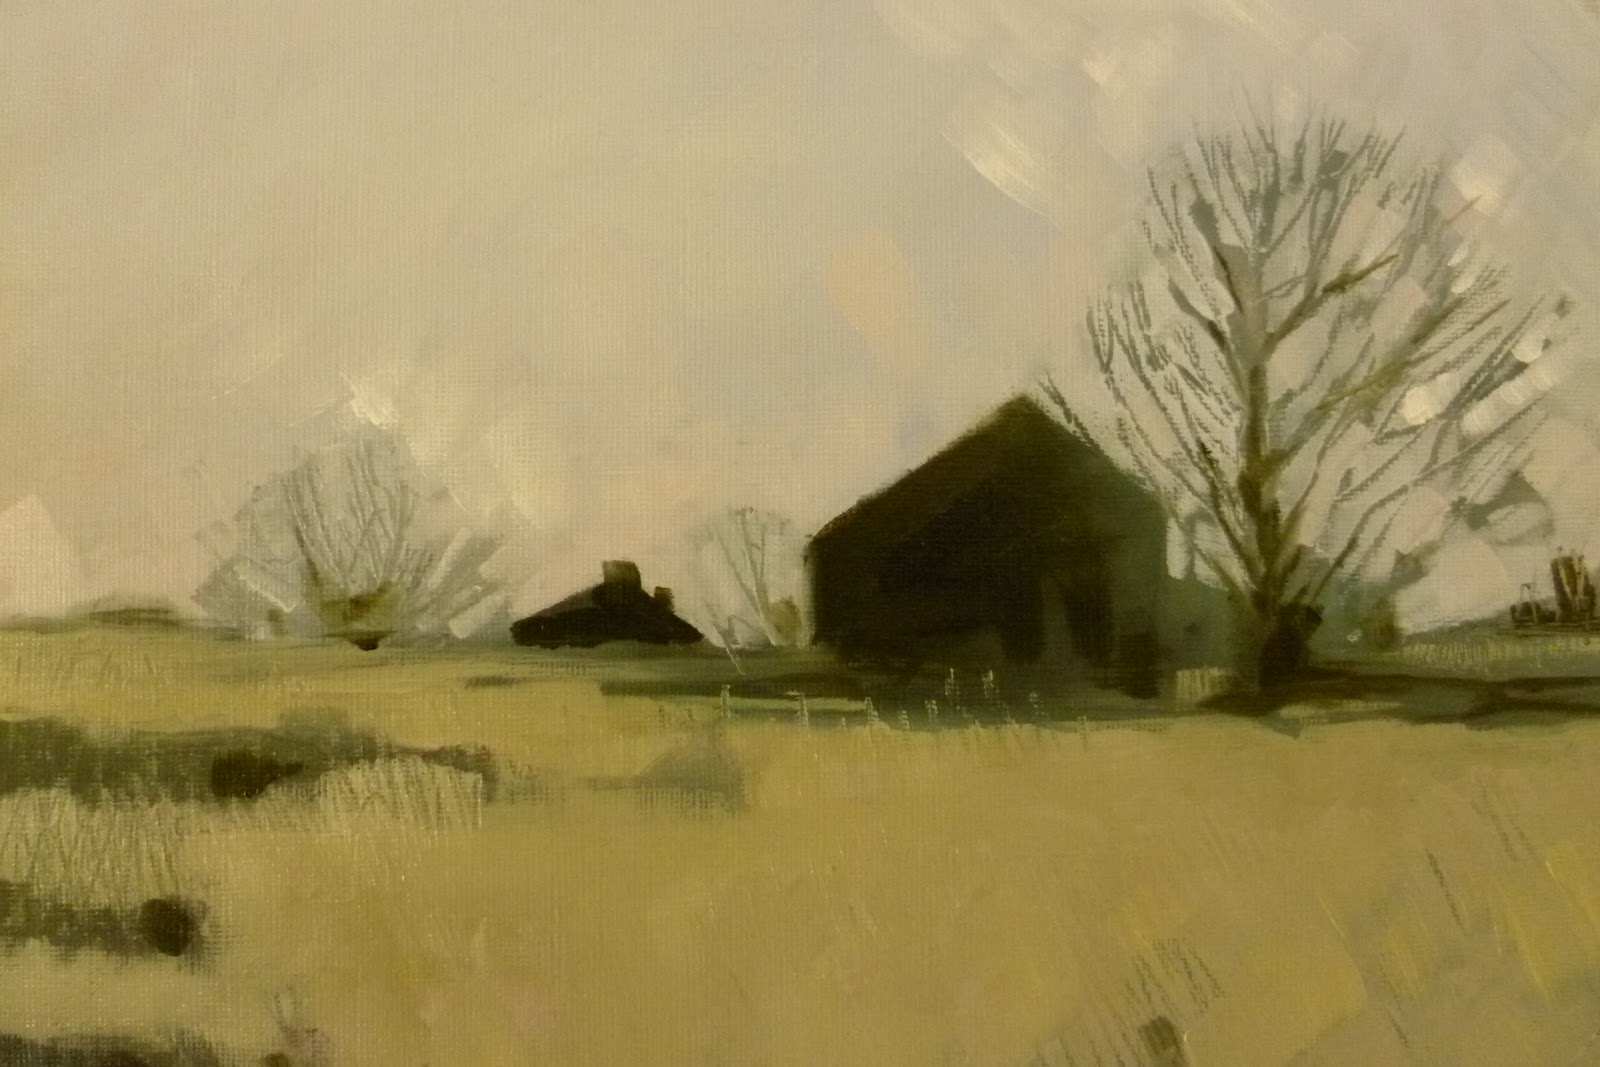 http://4.bp.blogspot.com/-n2ucXnAHatU/T6mPerWER_I/AAAAAAAA8Ek/tqL5-_2JThU/s1600/Pendle+Forest+winter+study.jpg